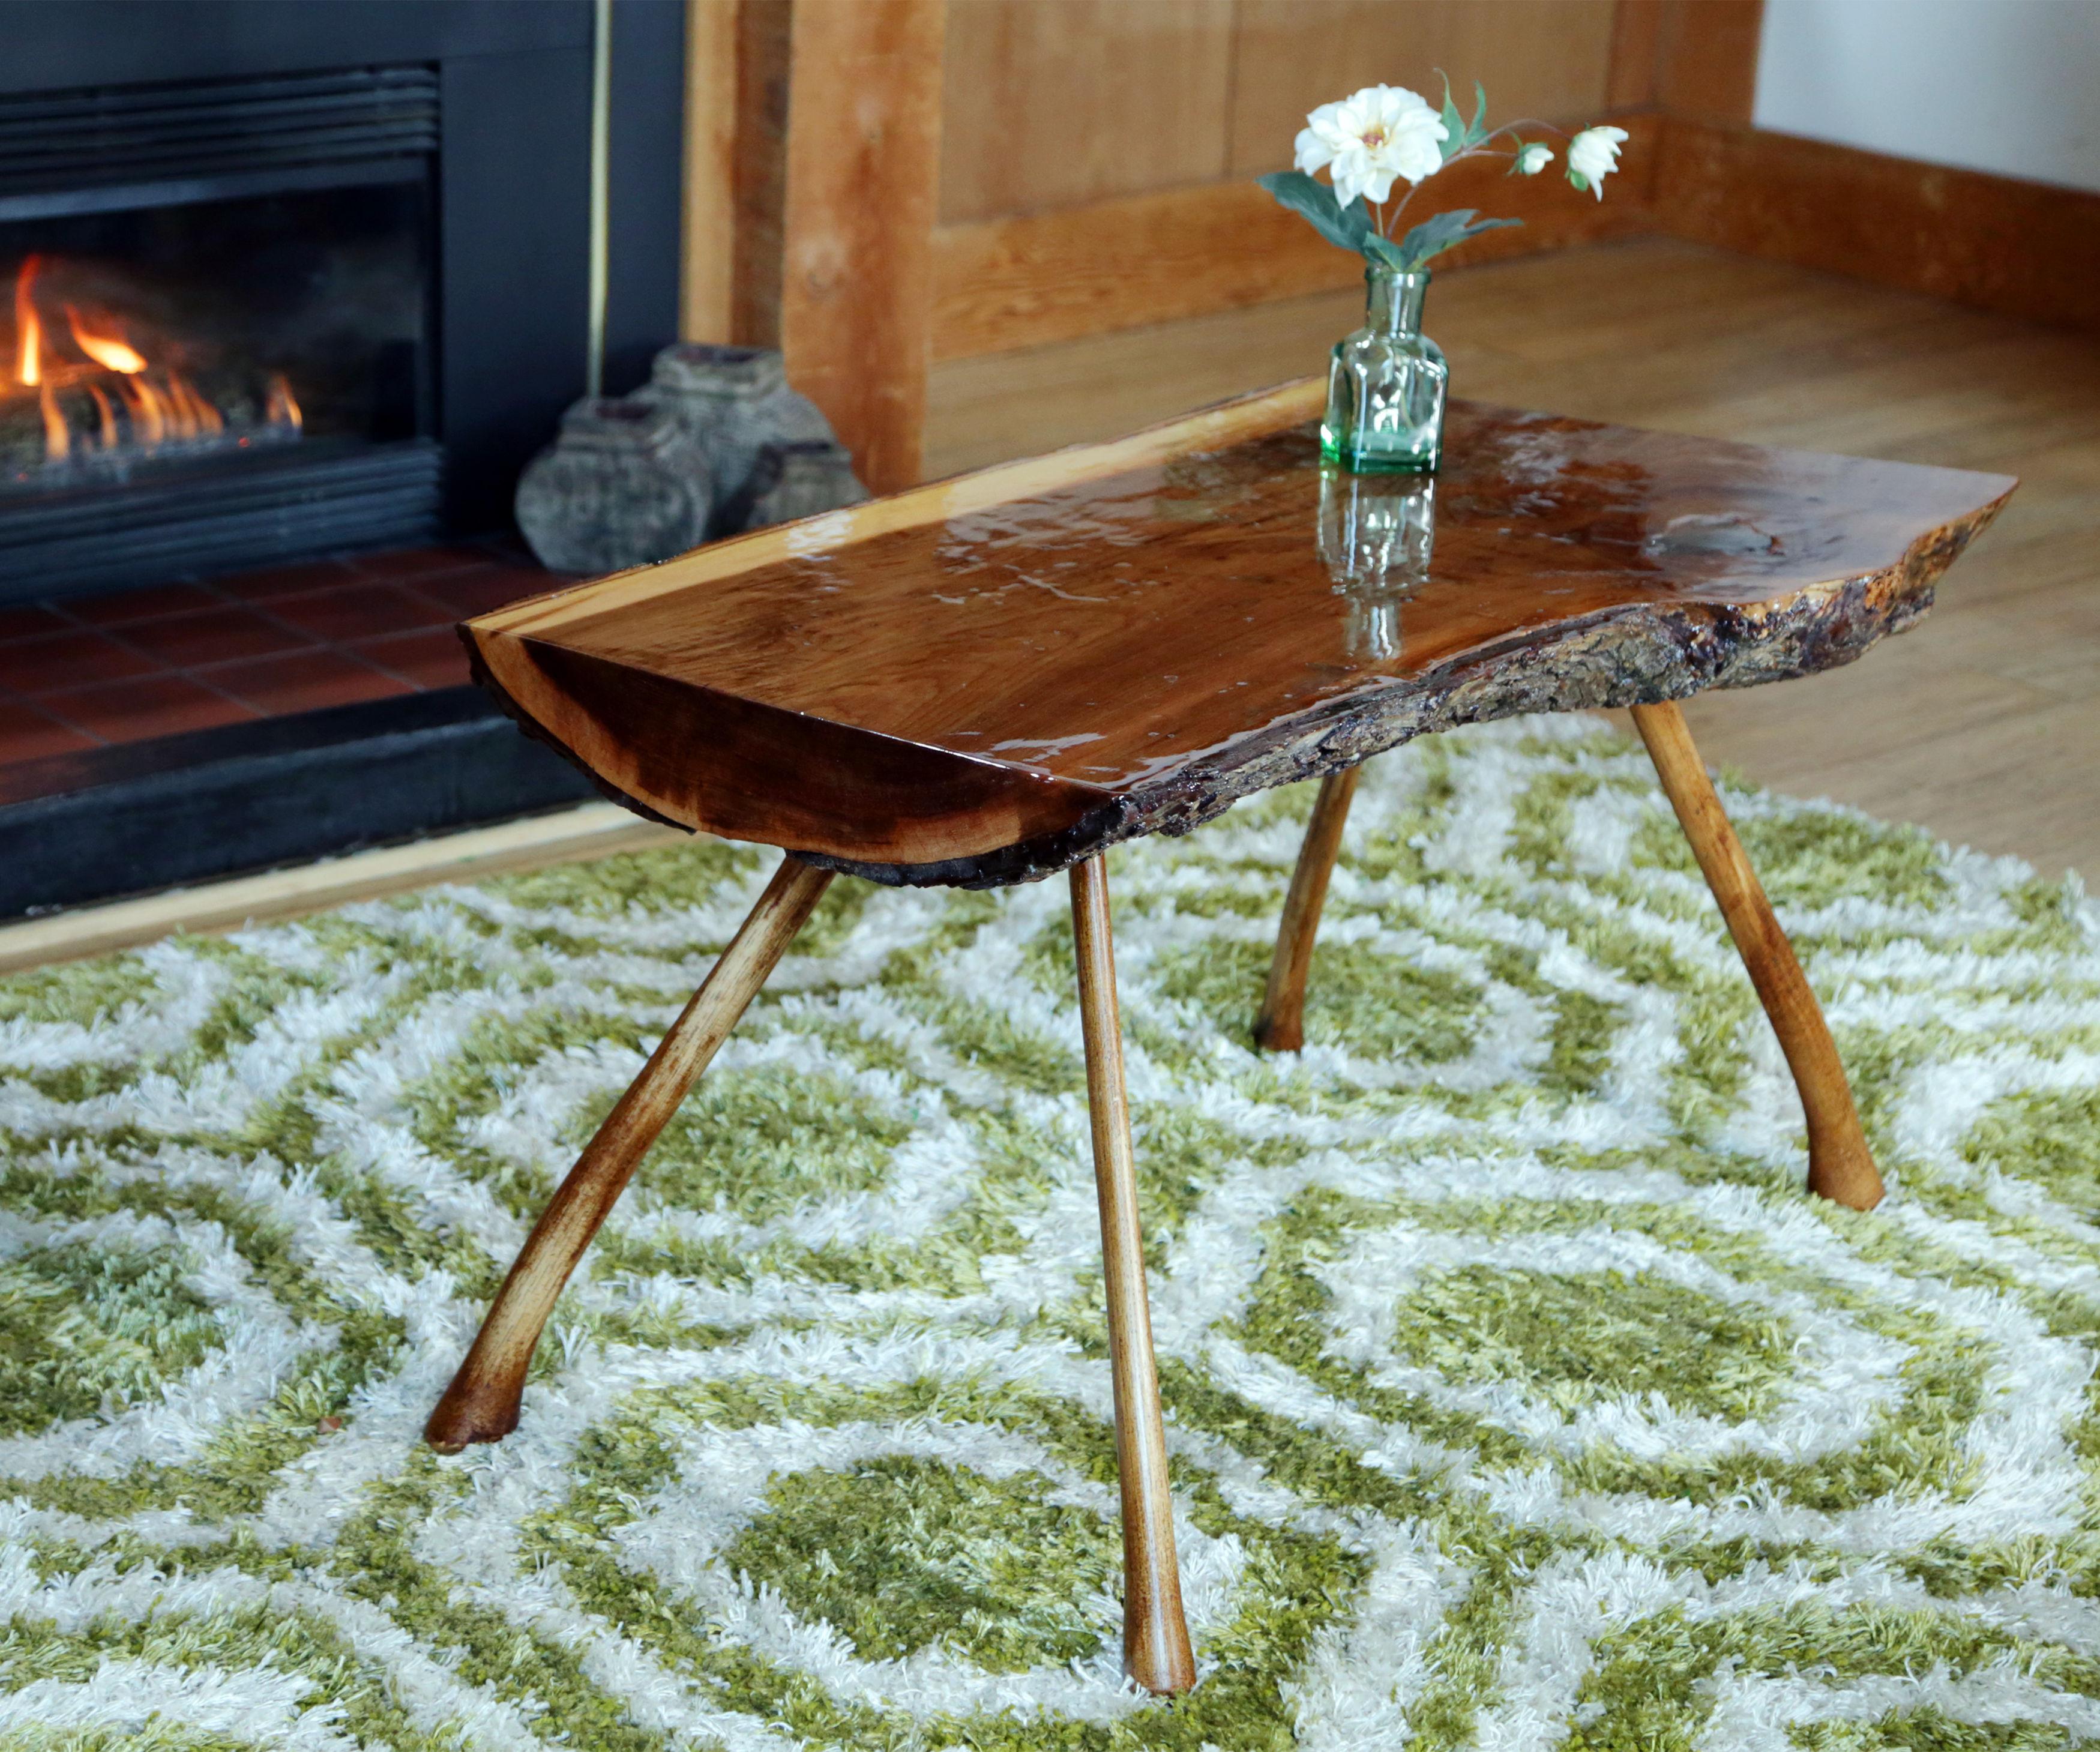 Lumberjack table